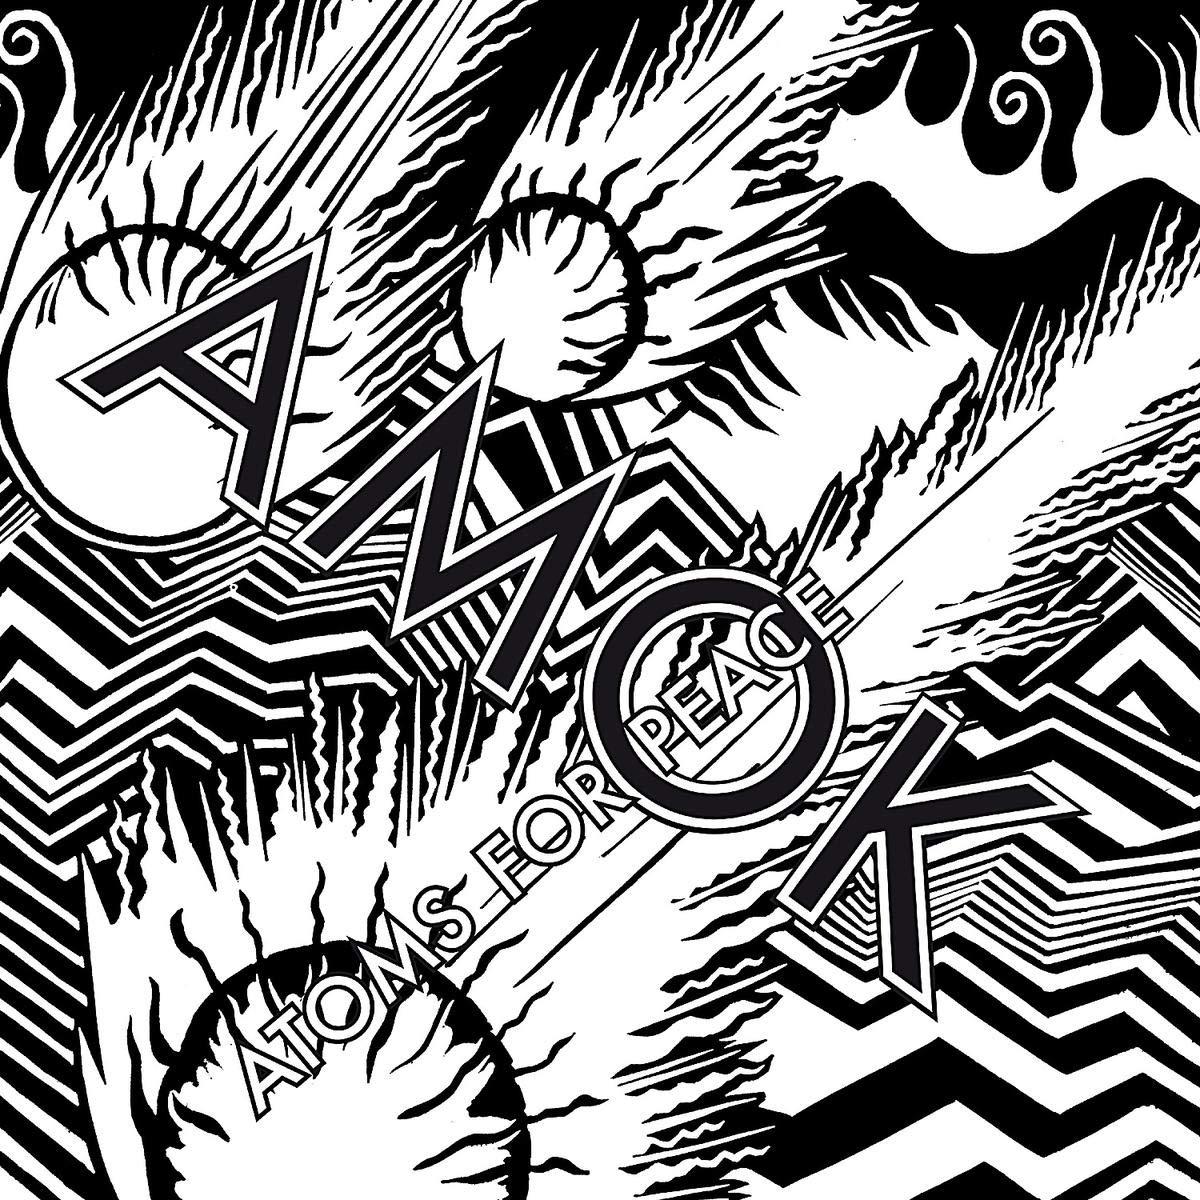 Atoms For Peace - Amok [2xLP]